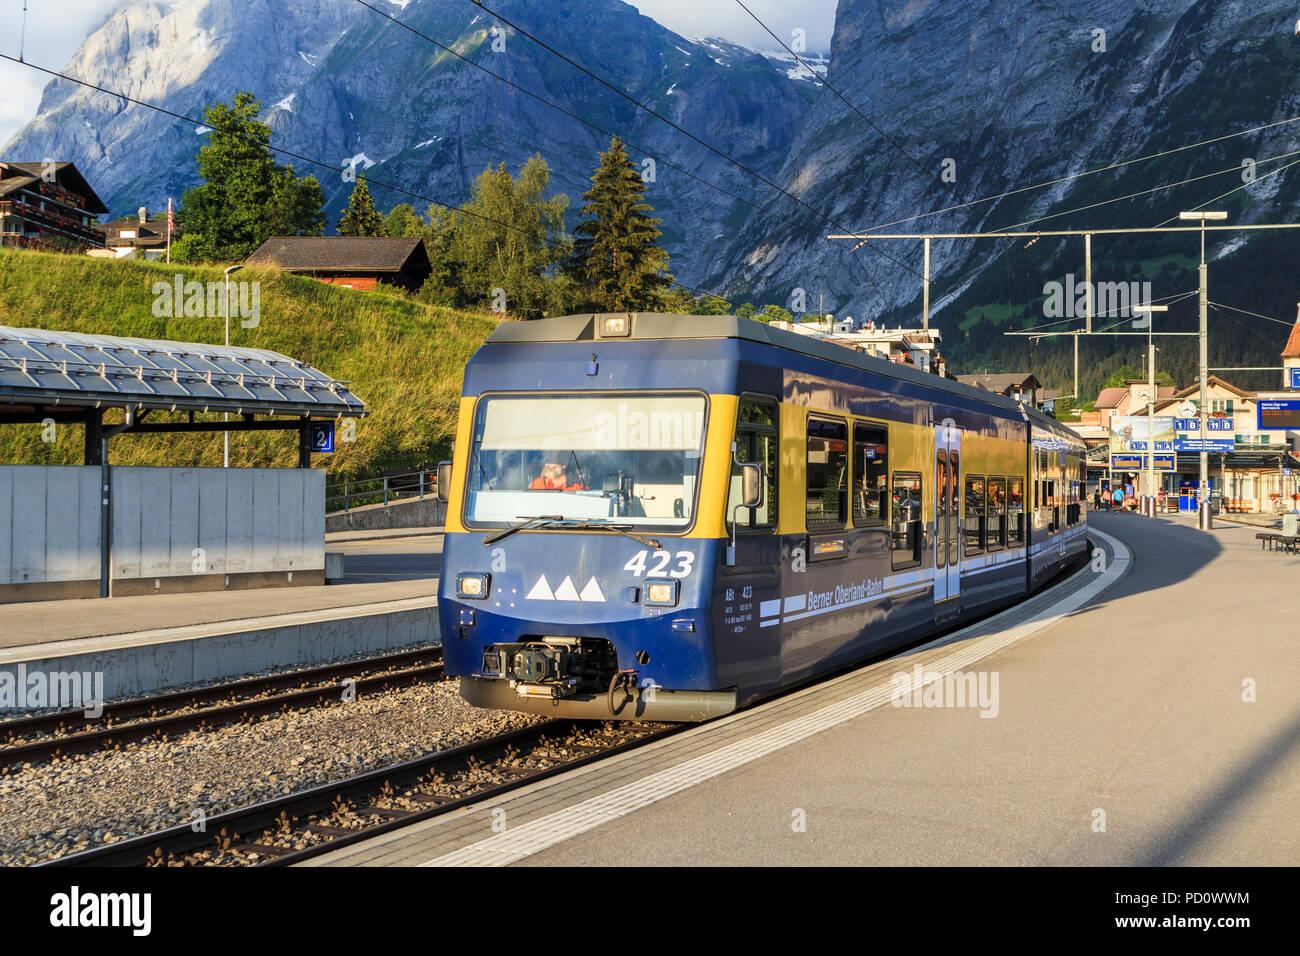 Berner Oberland Bahn (Bernese Oberland Railway) train to Interlaken Ost in Grindelwald station, Bernese Oberland, Switzerland - Stock Image